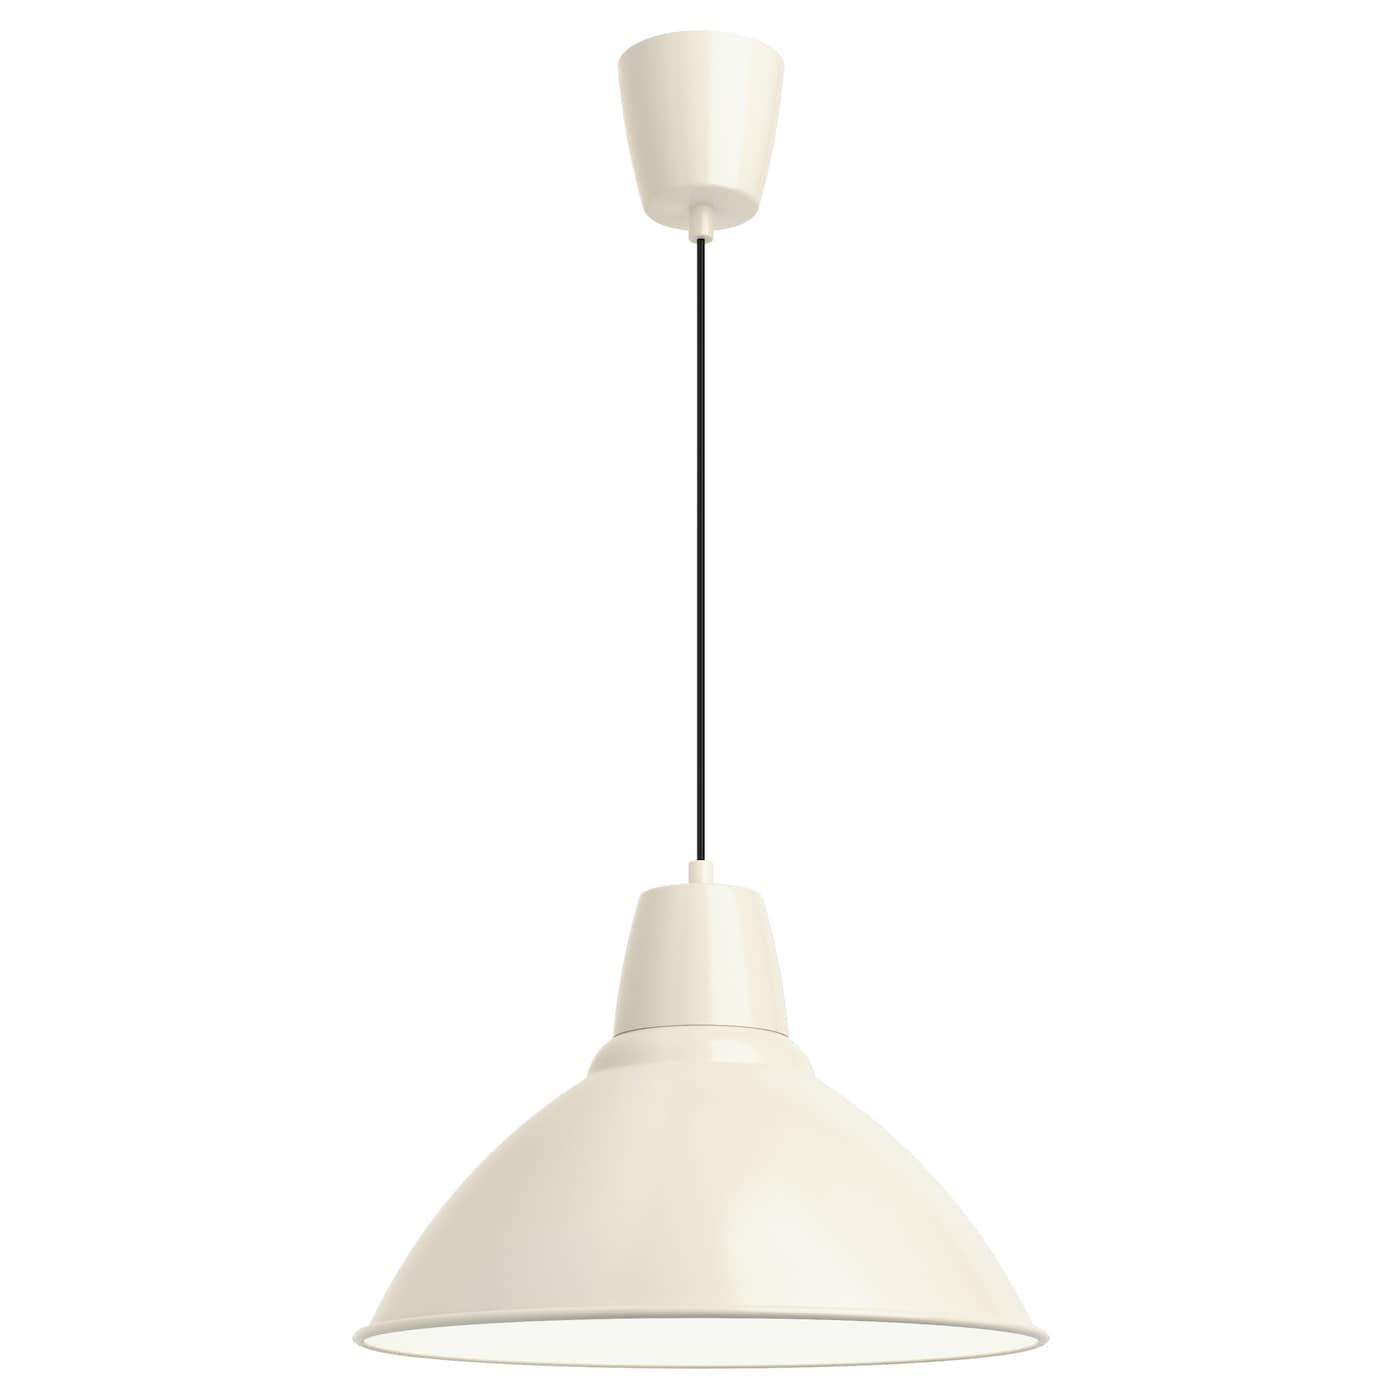 Ikea ceiling lights led ceiling lights ikea foto pendant lamp aloadofball Image collections